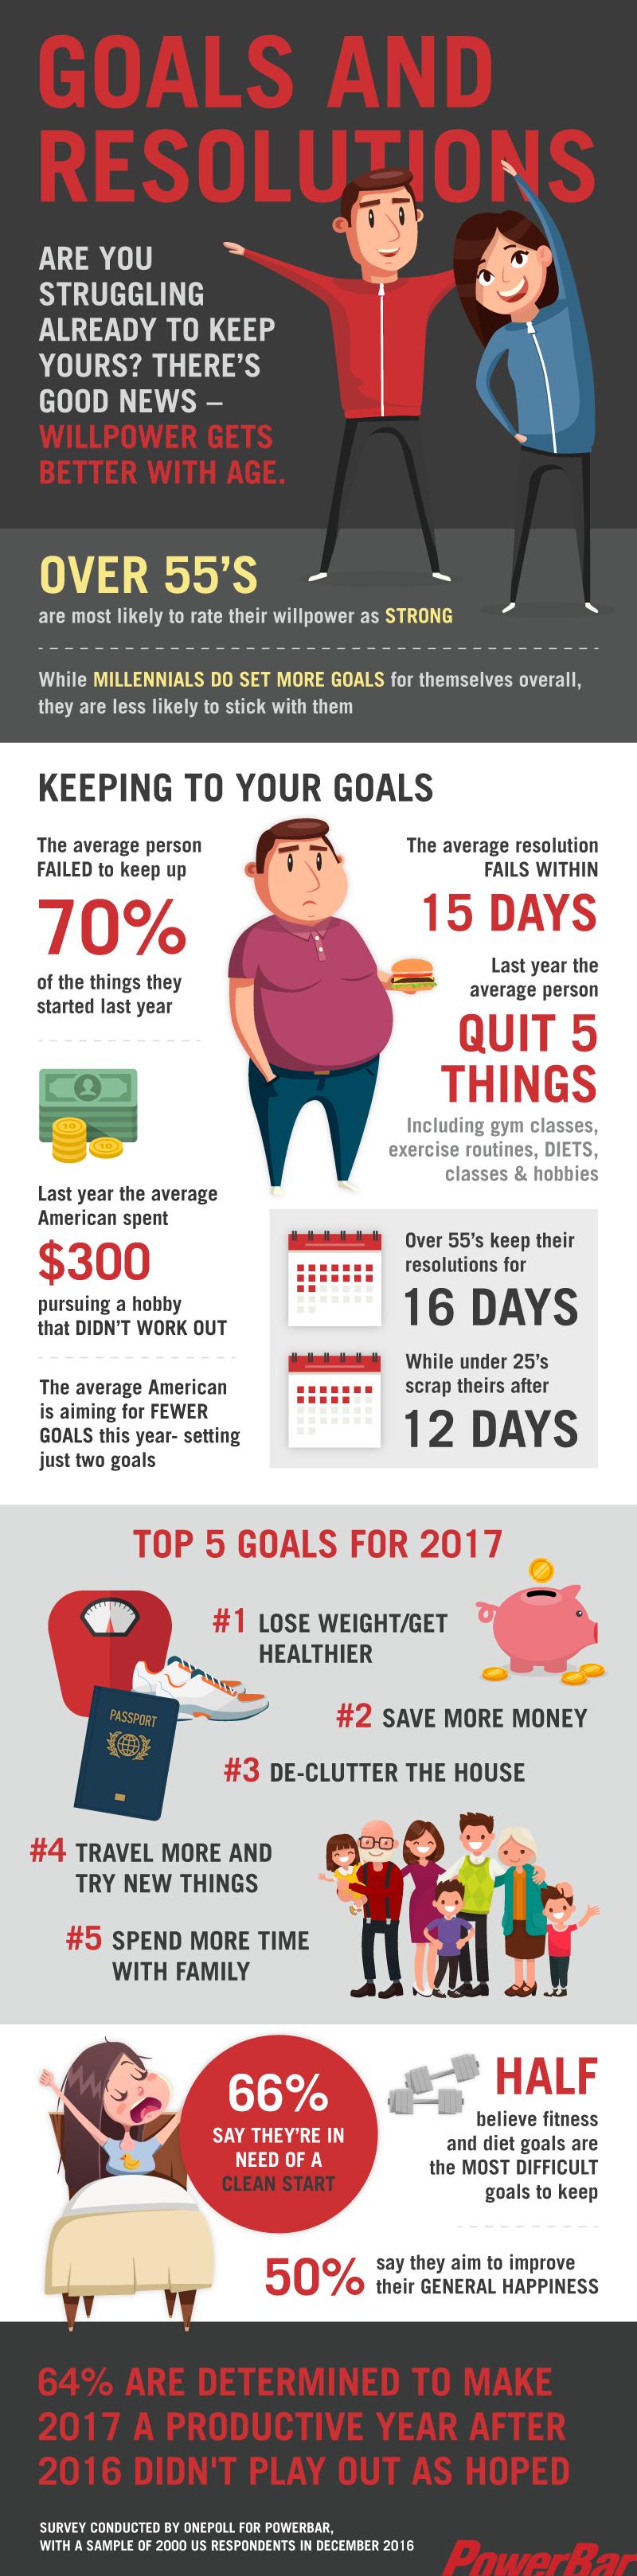 Powerbar Infographic